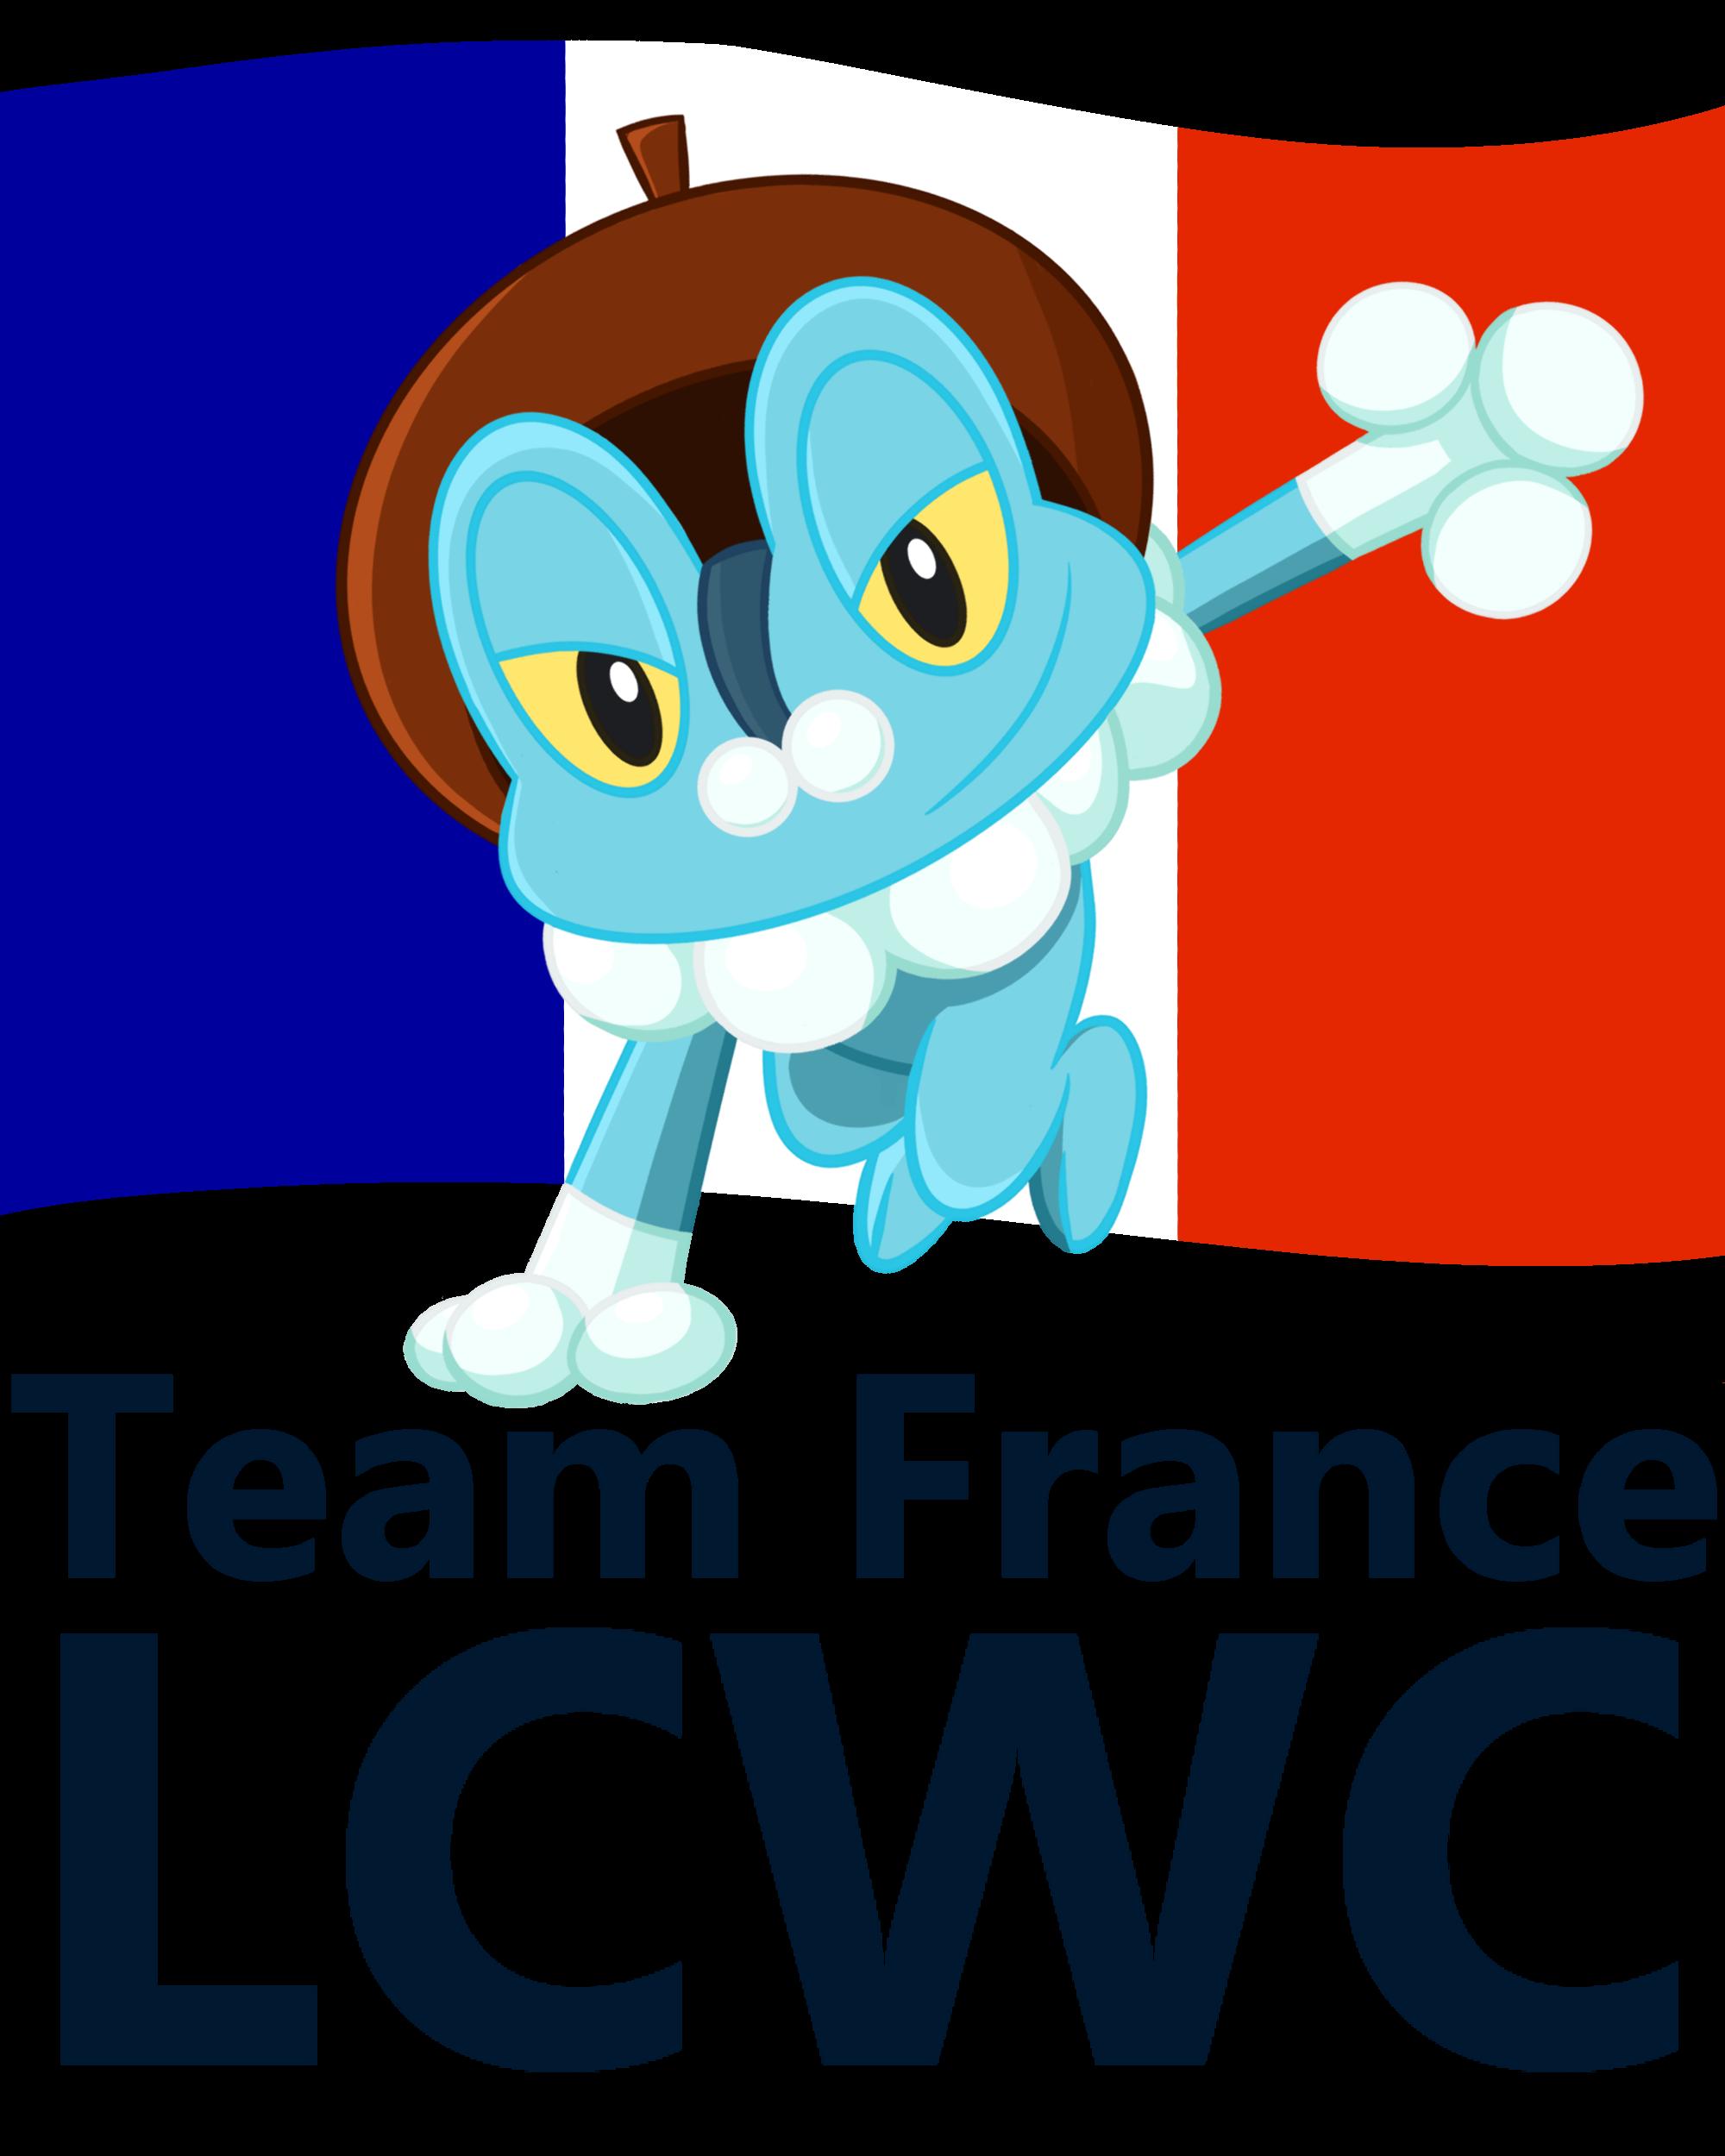 Teamfrancelcwc.png